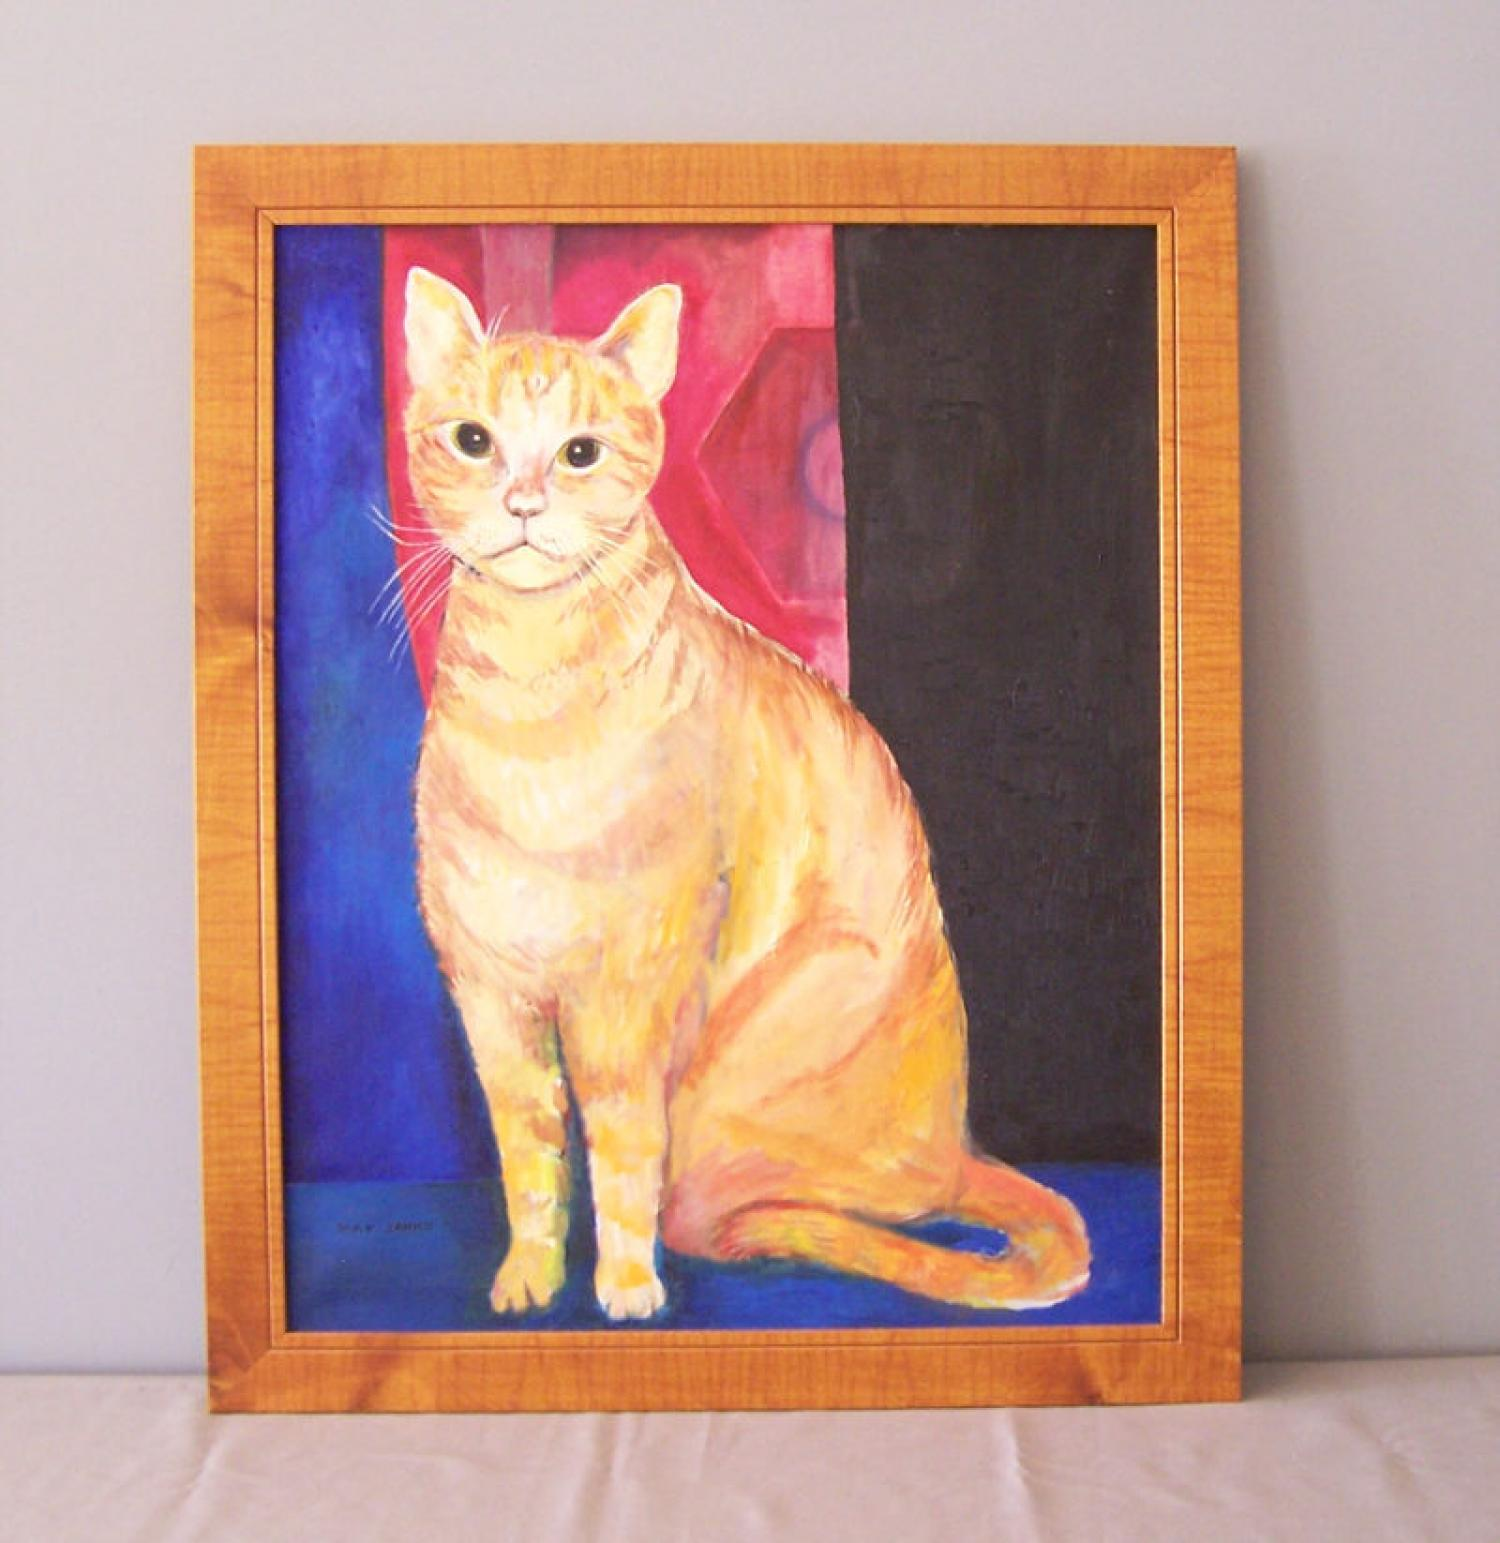 May Janko cat portrait painting of Yo Yo